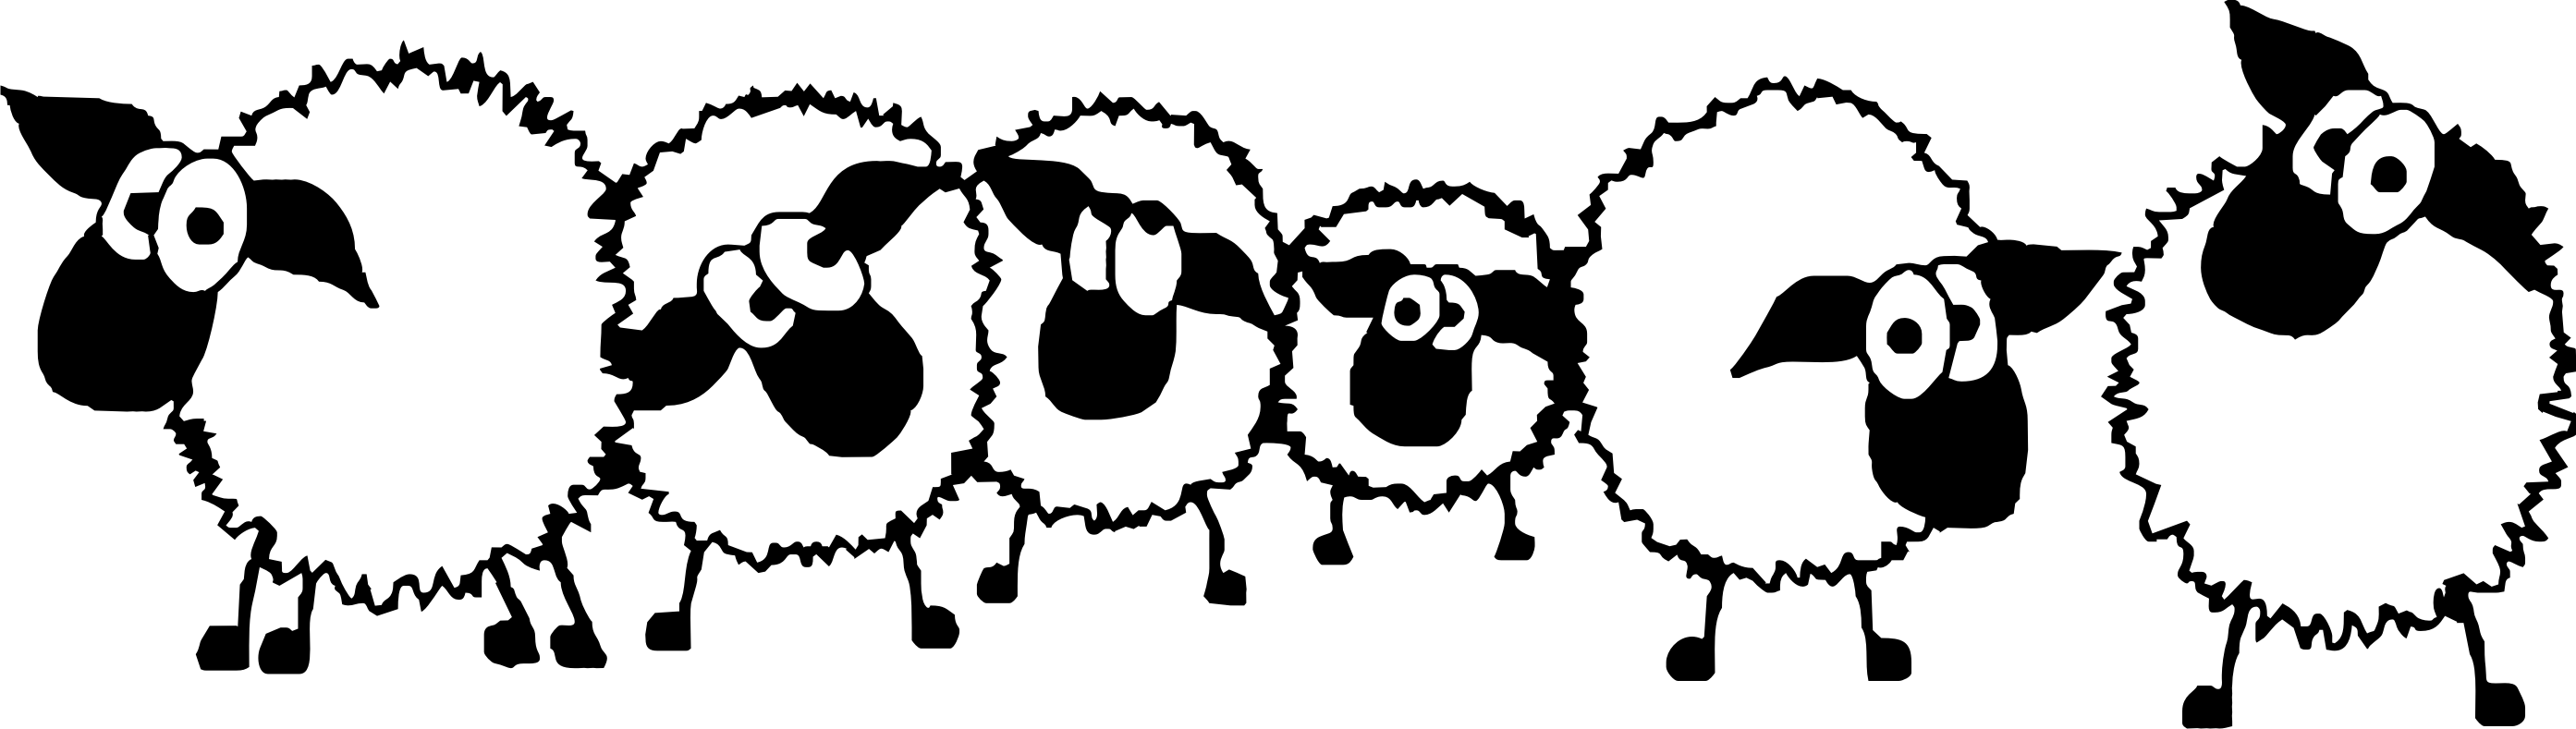 Sheep clipart border #1